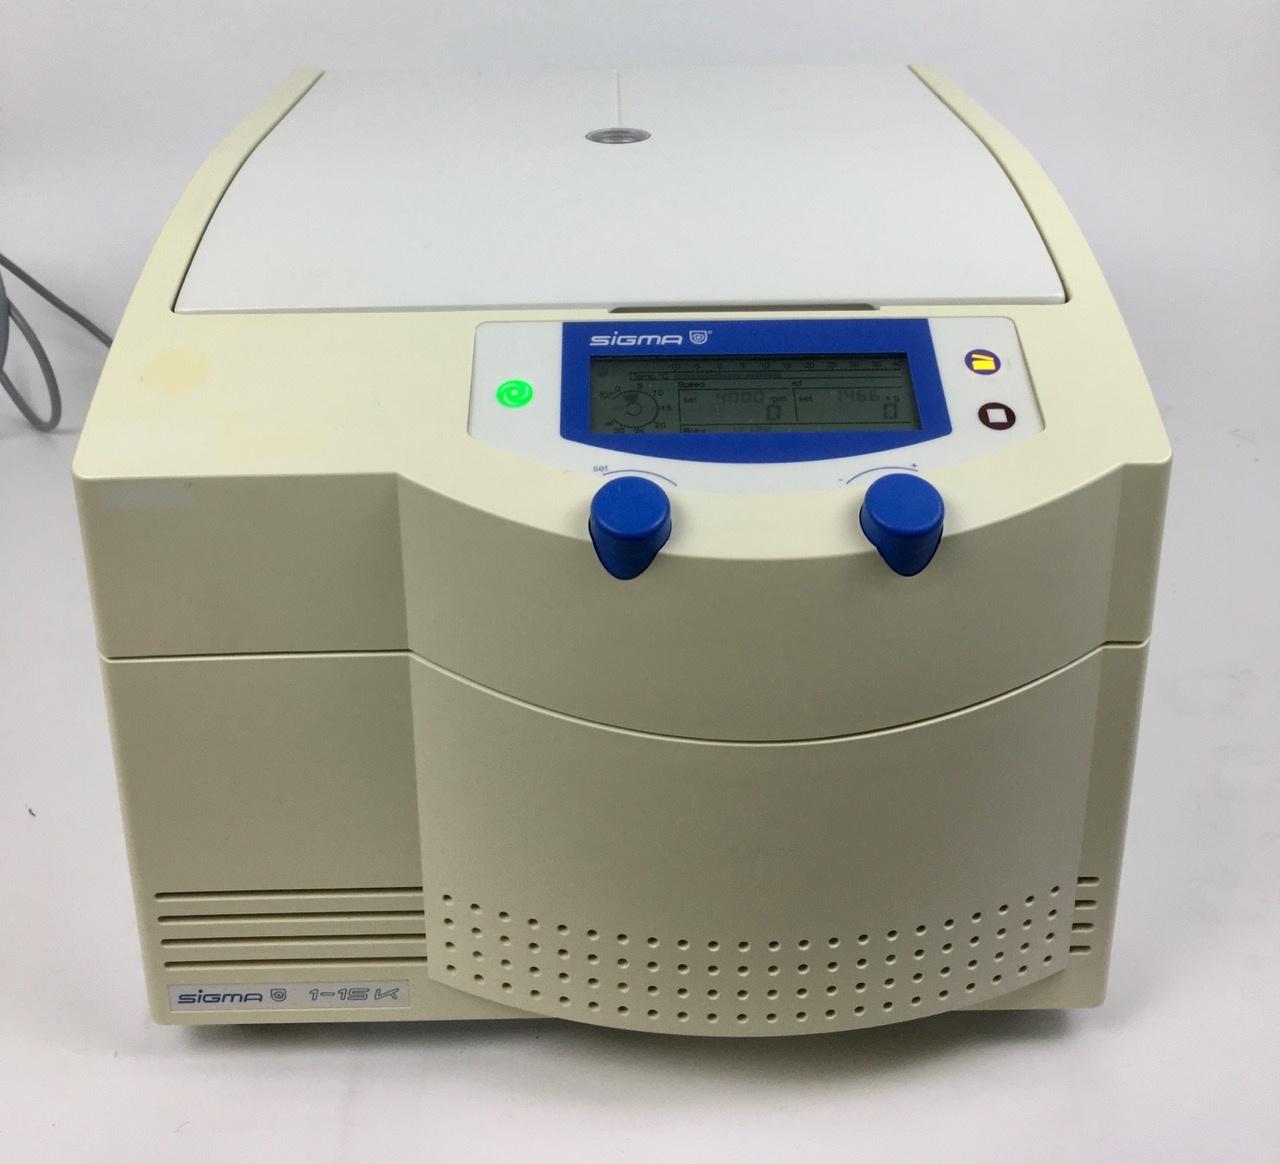 Sigma Sigma 1-15K Microcentrifuge (refrigerated)